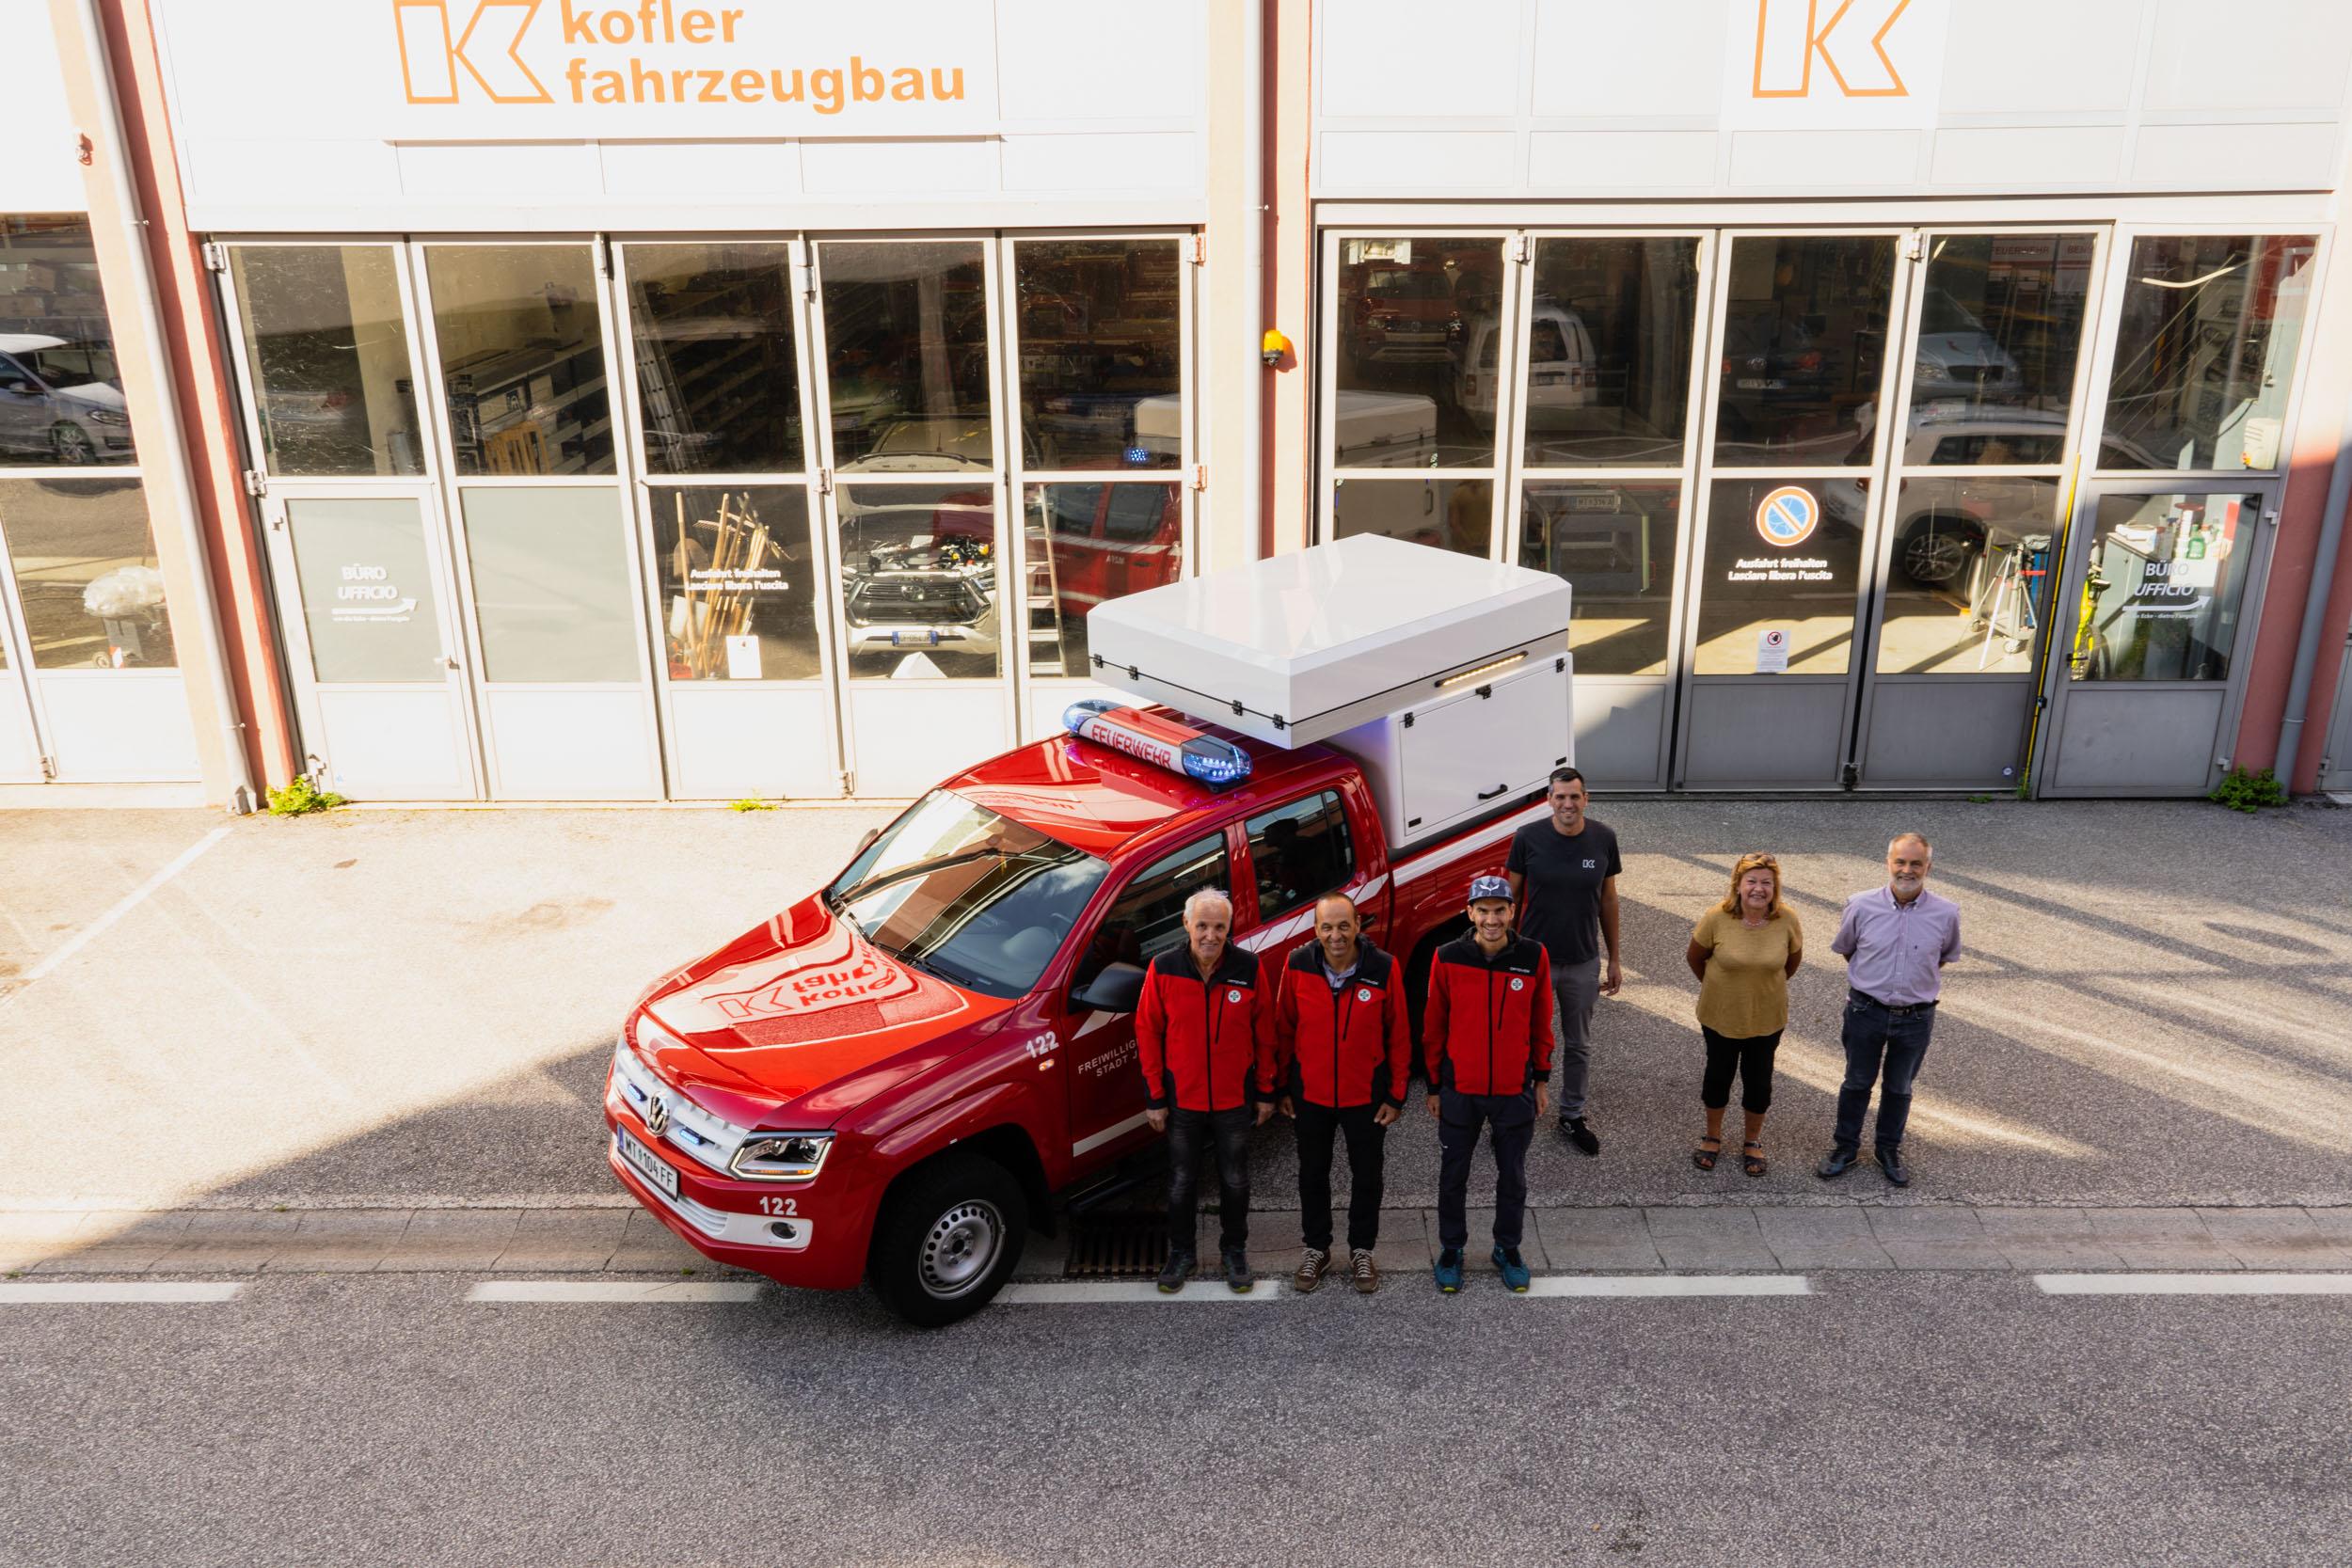 Kofler-Fahrzeugbau-BRD-Judenburg